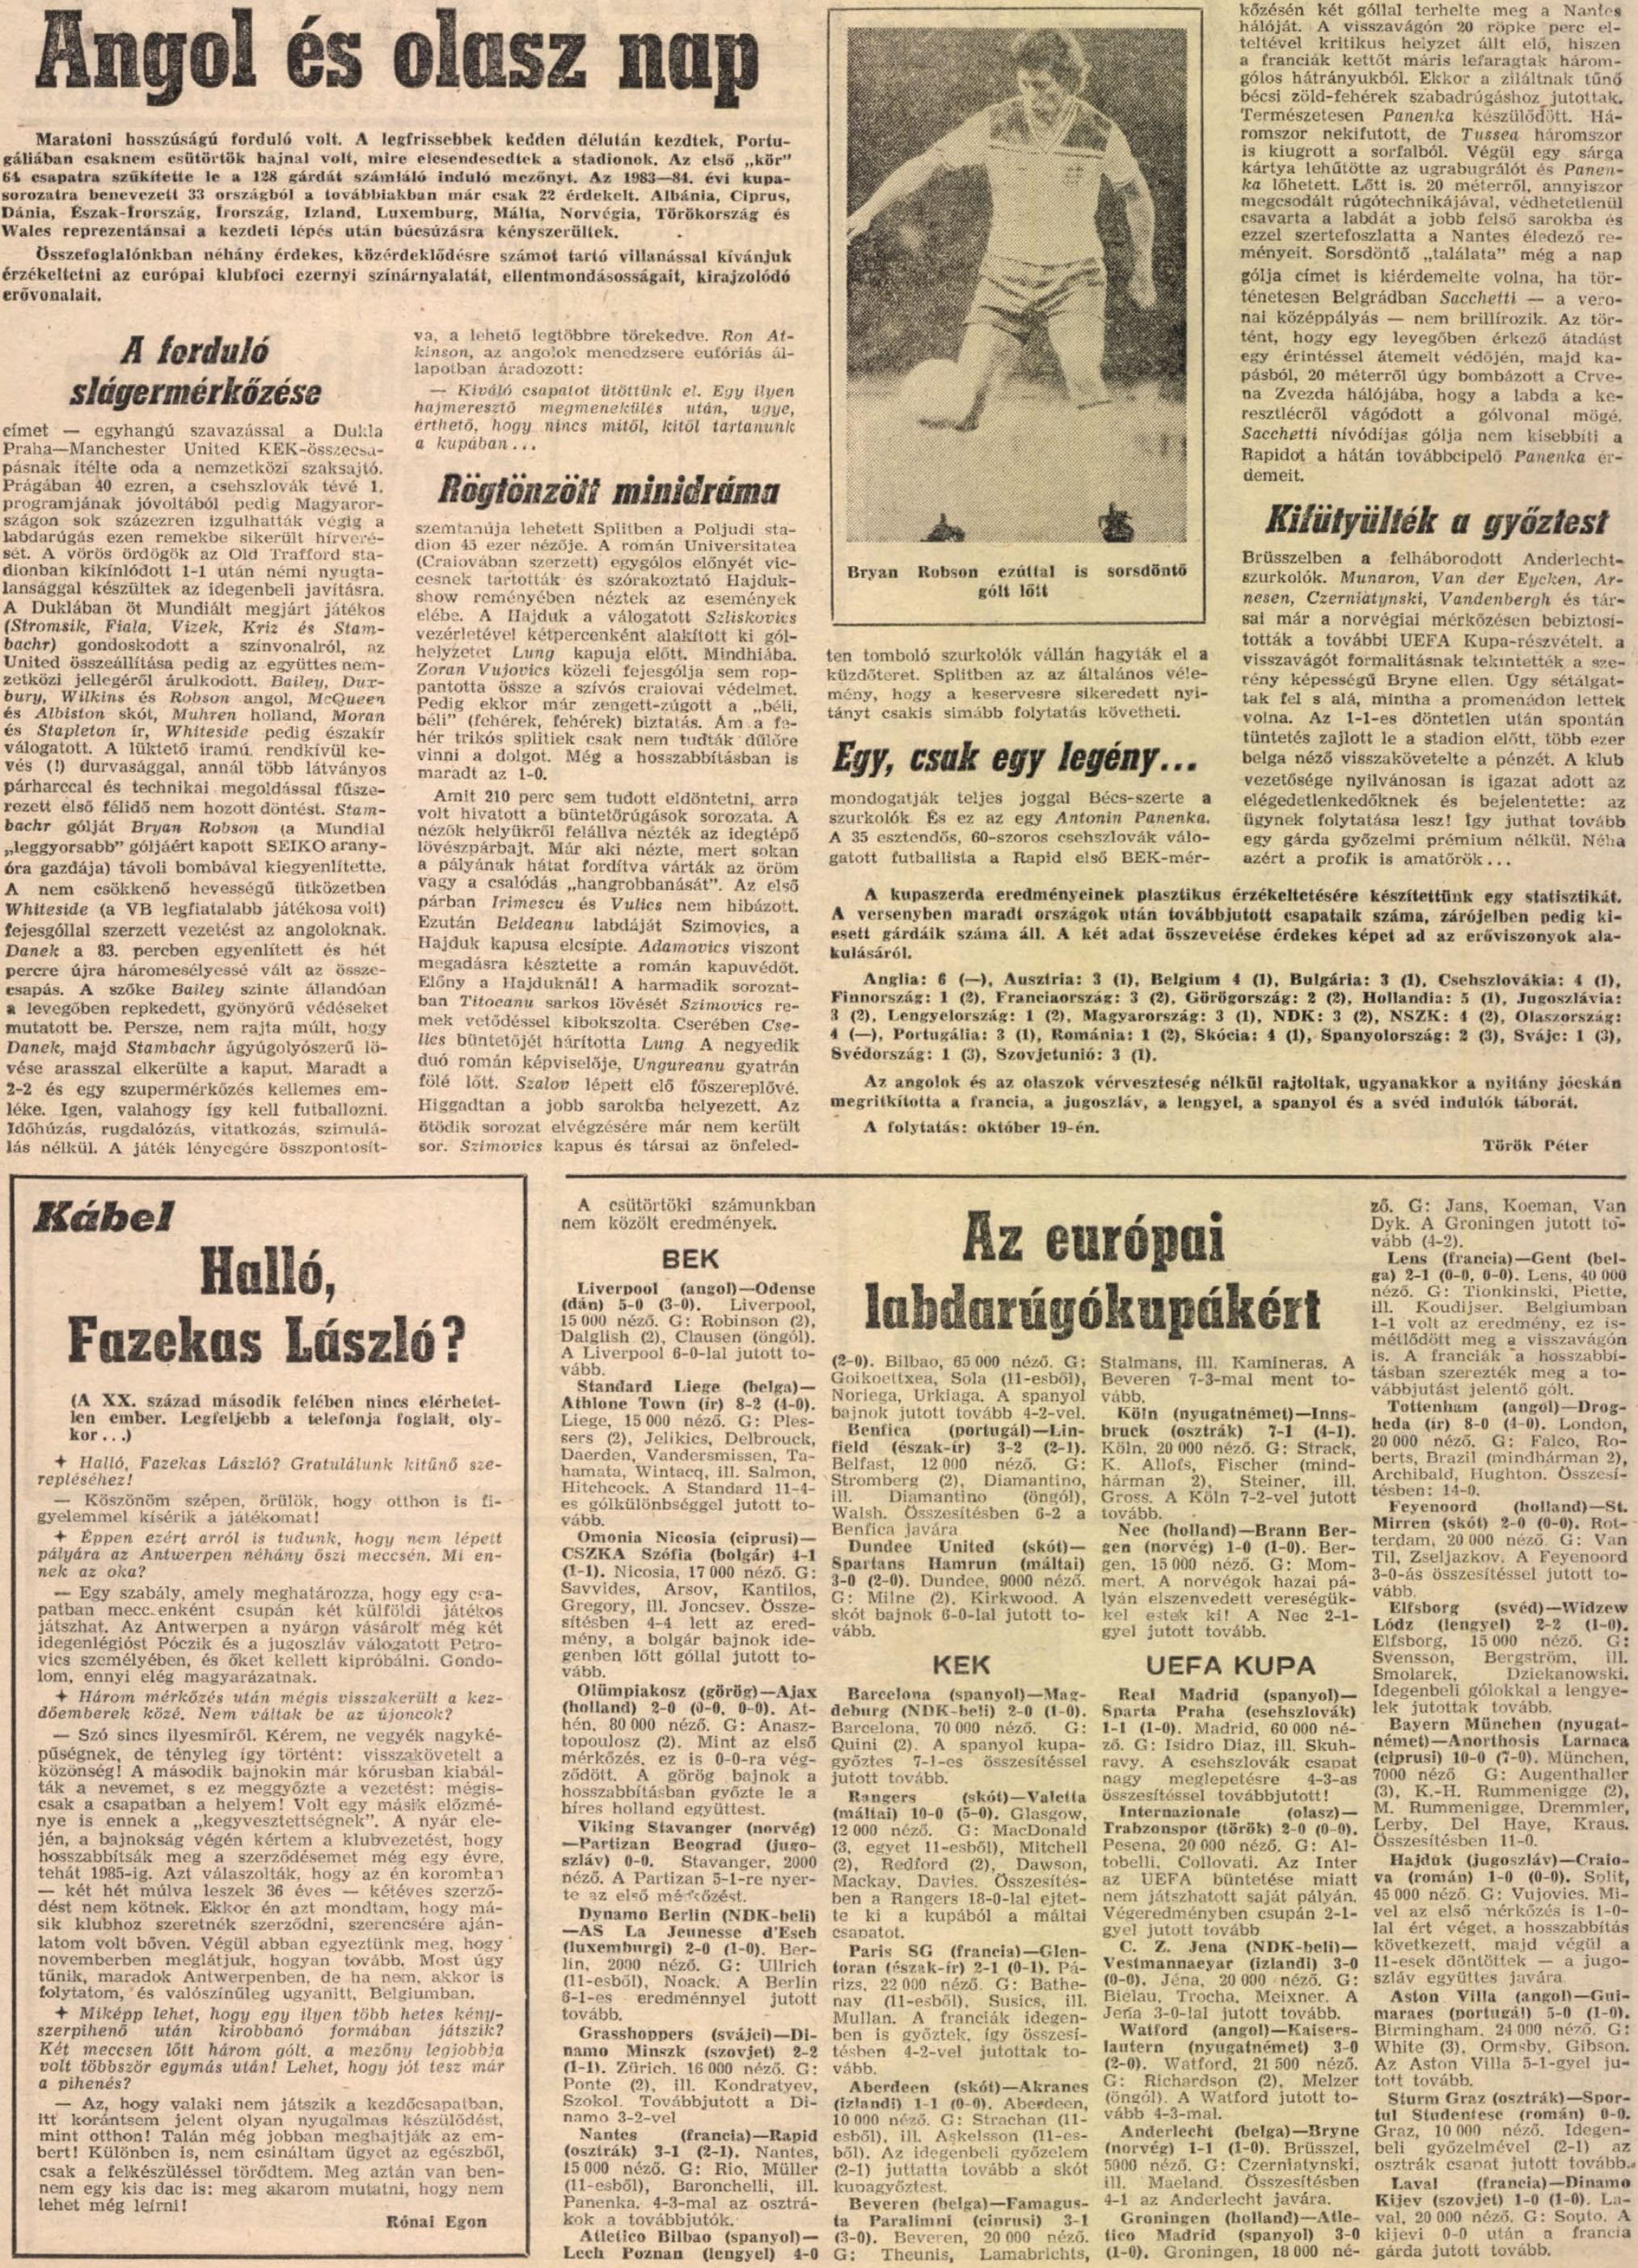 idokapszula_nb_i_1983_84_klubcsapataink_nemzetkozi_kupaszereplese_1_fordulo_2_kor_kupaszerda_2.jpg